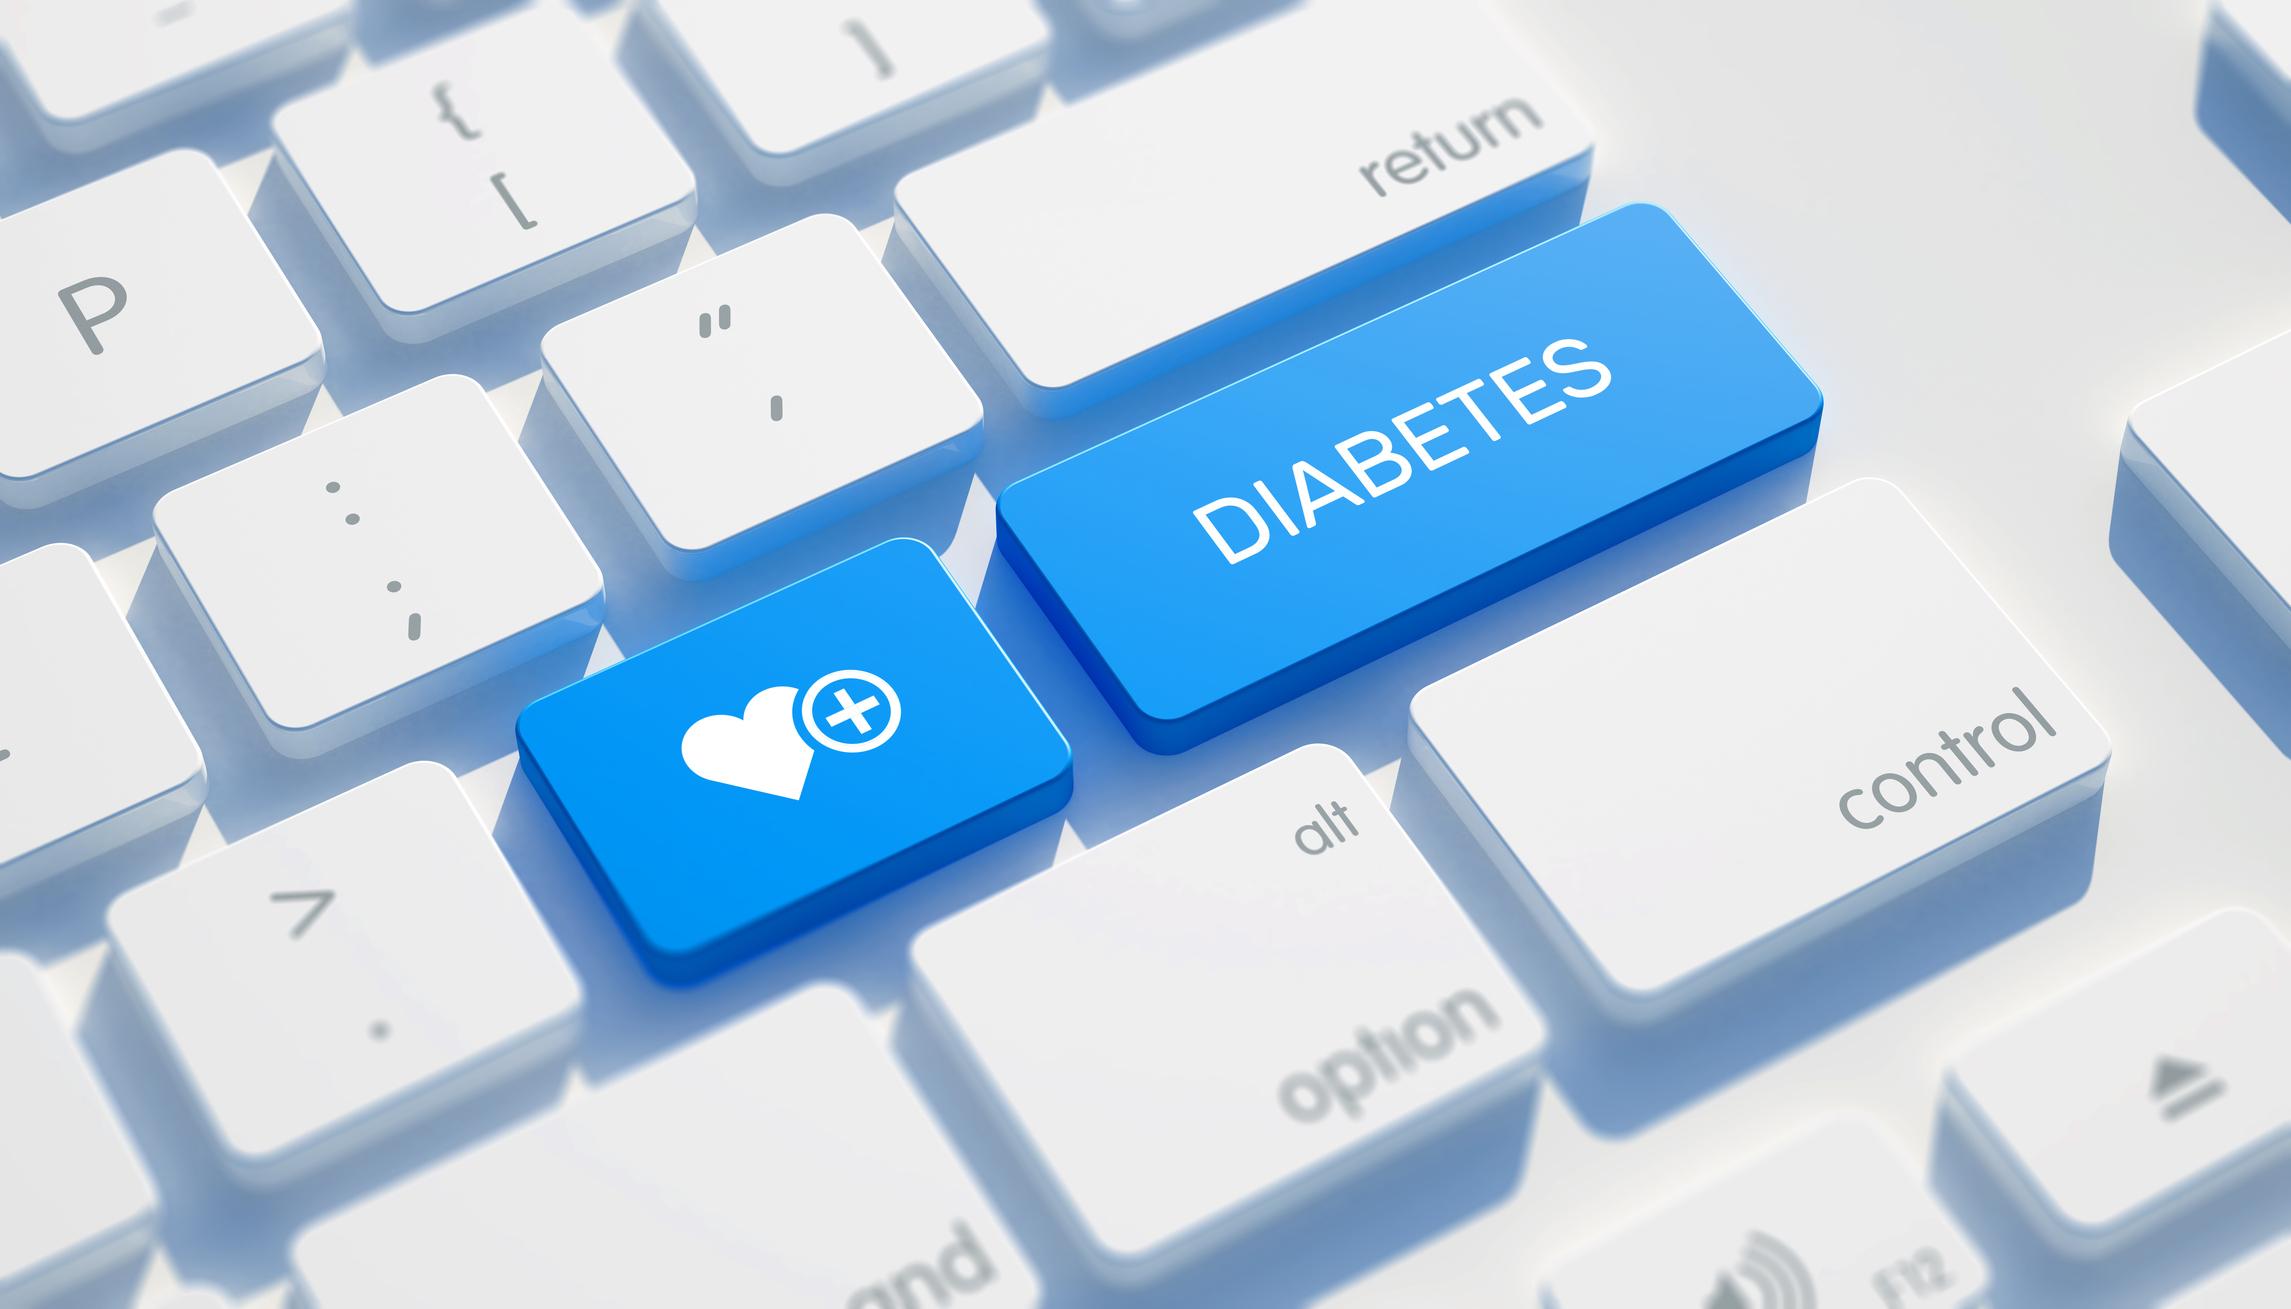 Word diabetes on a keyboard